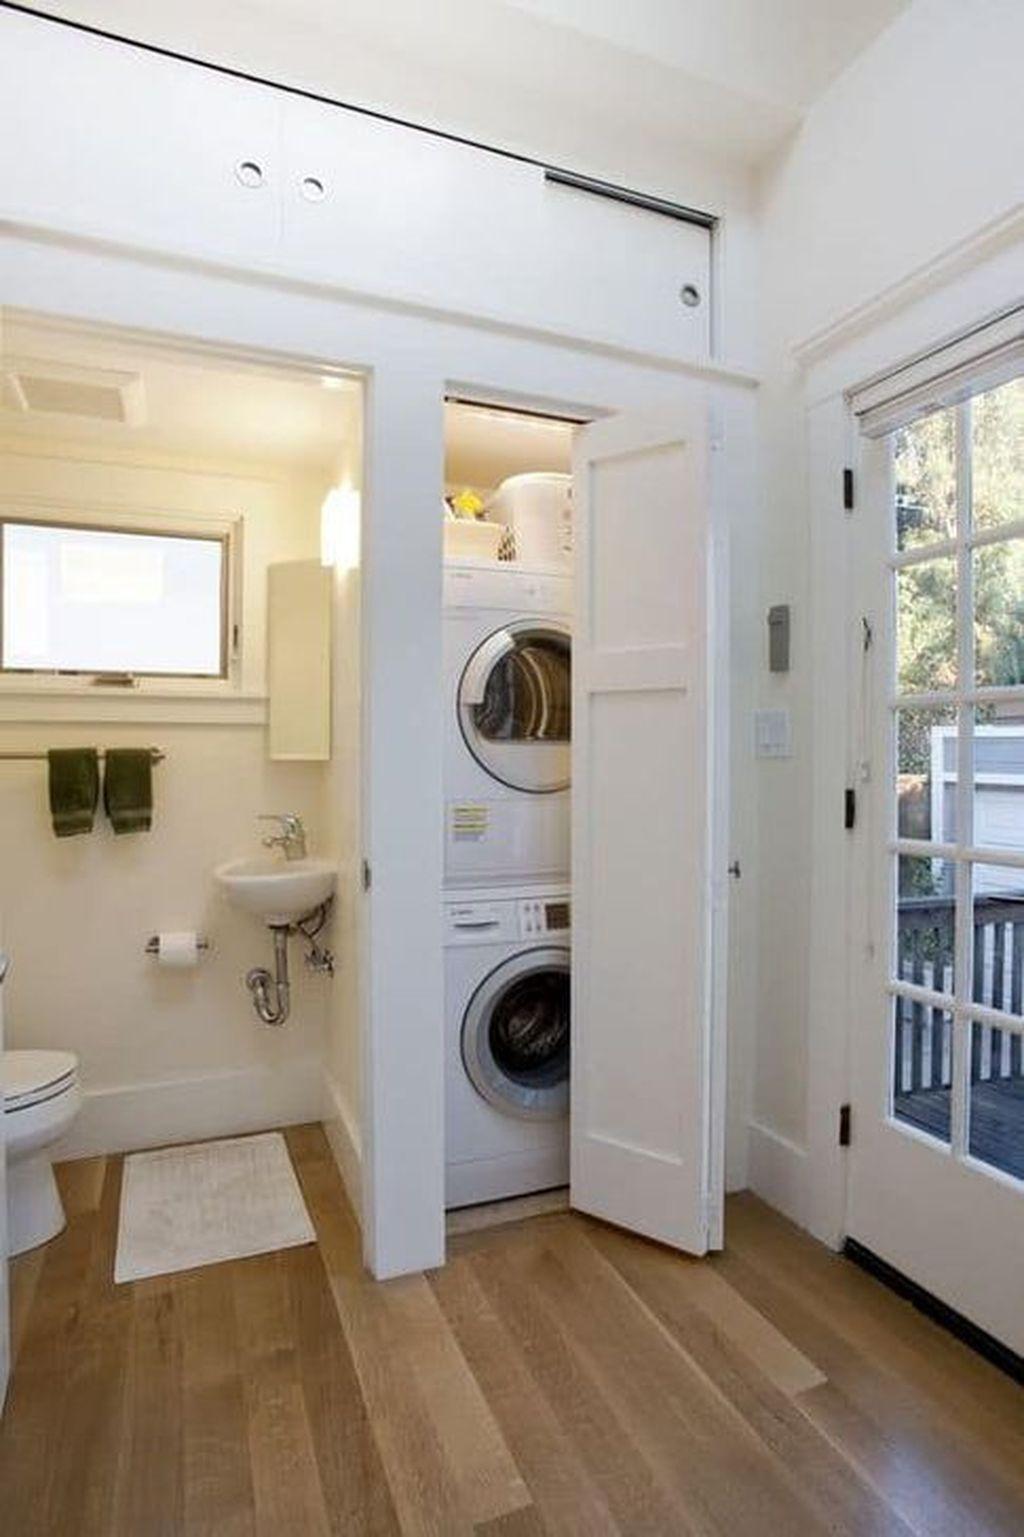 39 Stunning Laundry Room Design Decor Ideas To Try